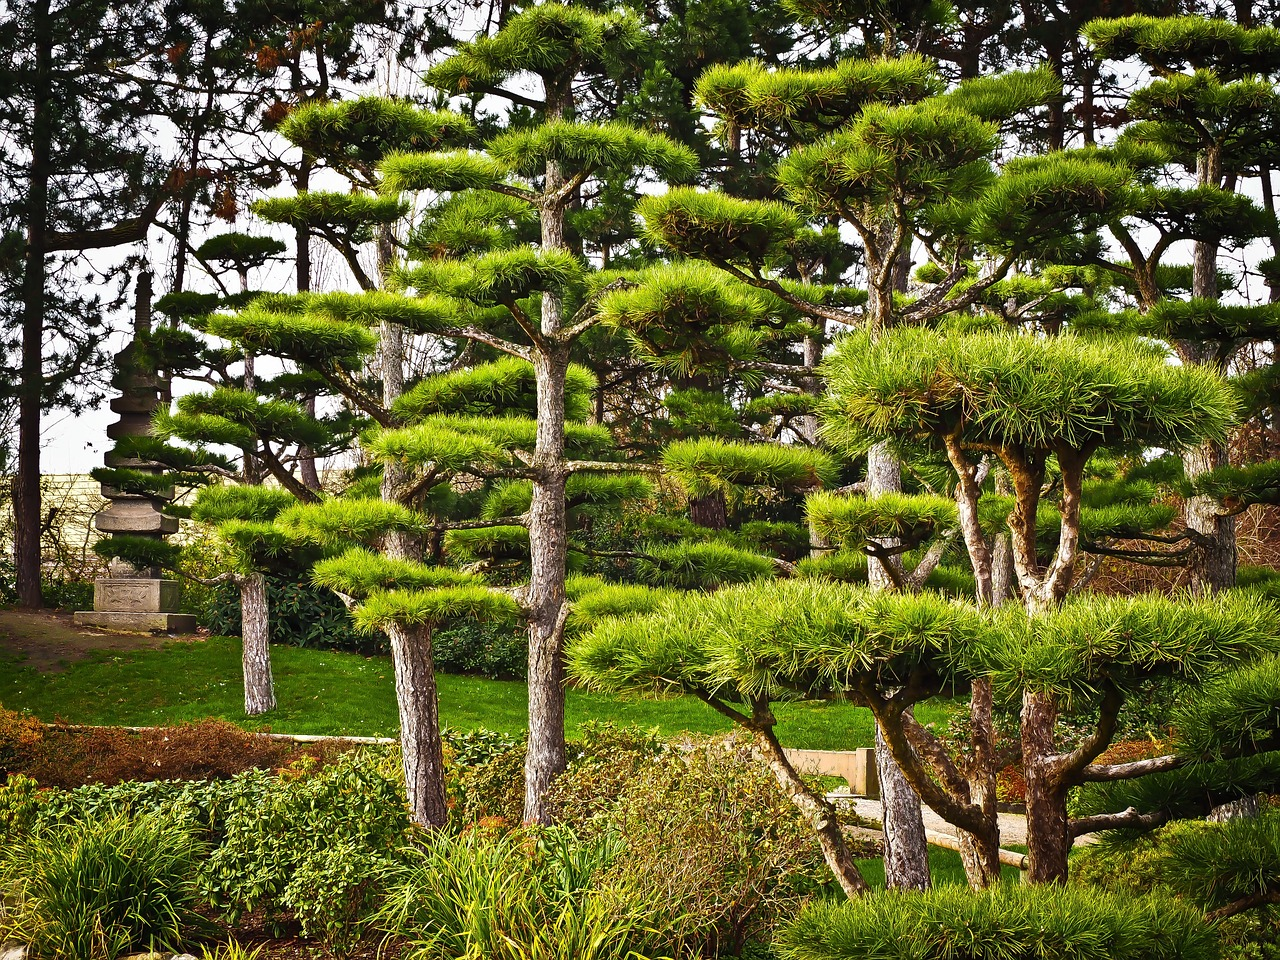 Japanese Yew Trees